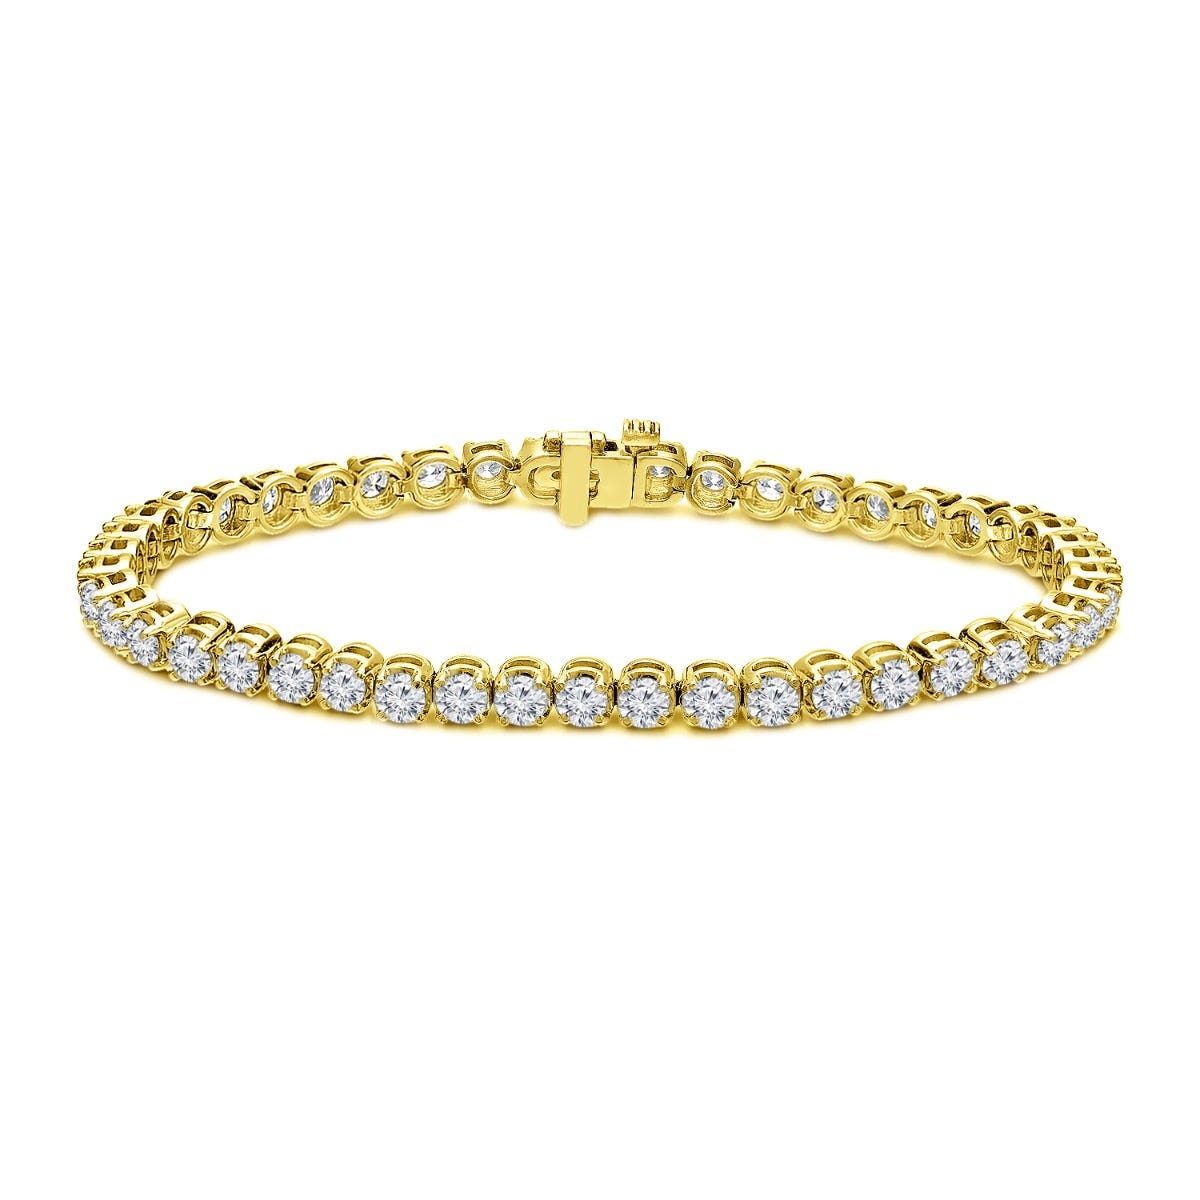 6ctw. 4-Prong Round Link Diamond Tennis Bracelet in 14K Yellow Gold (JK, I2-I3)